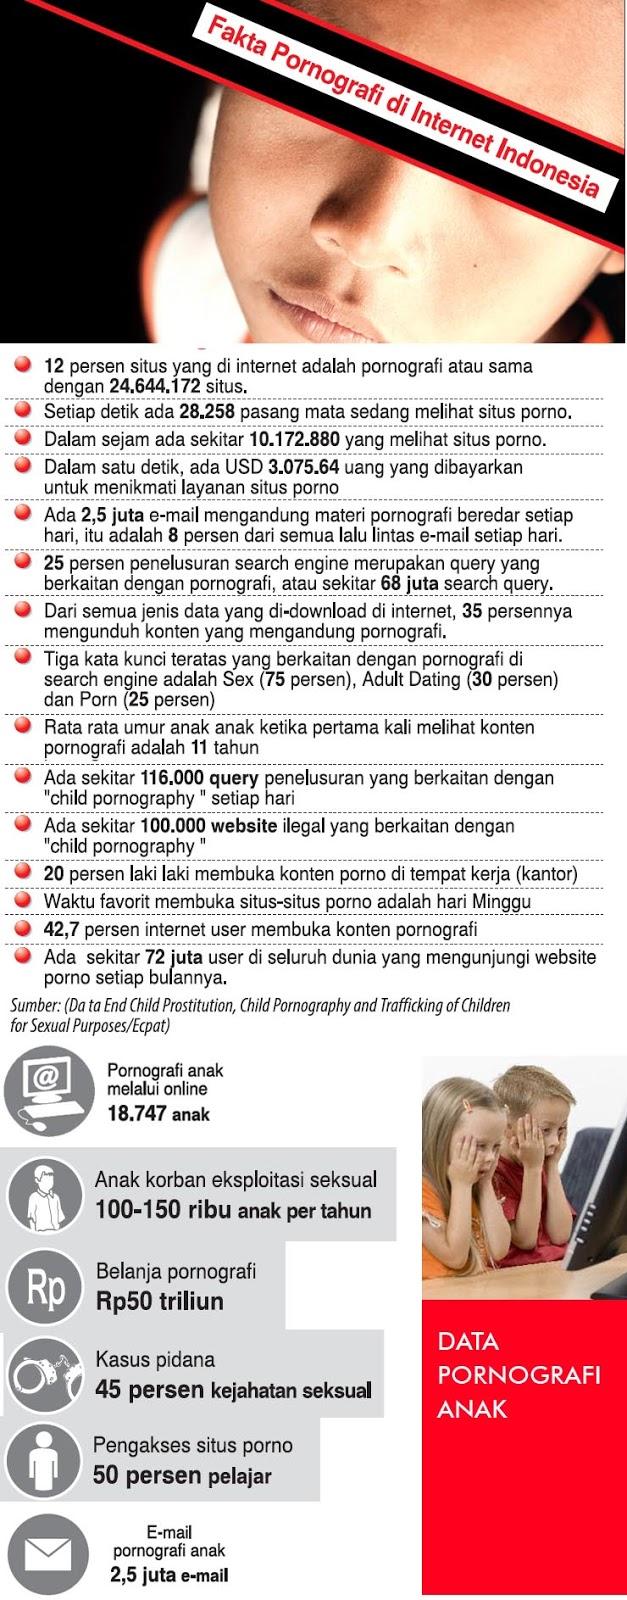 Fakta Pornografi di Internet Indonesia